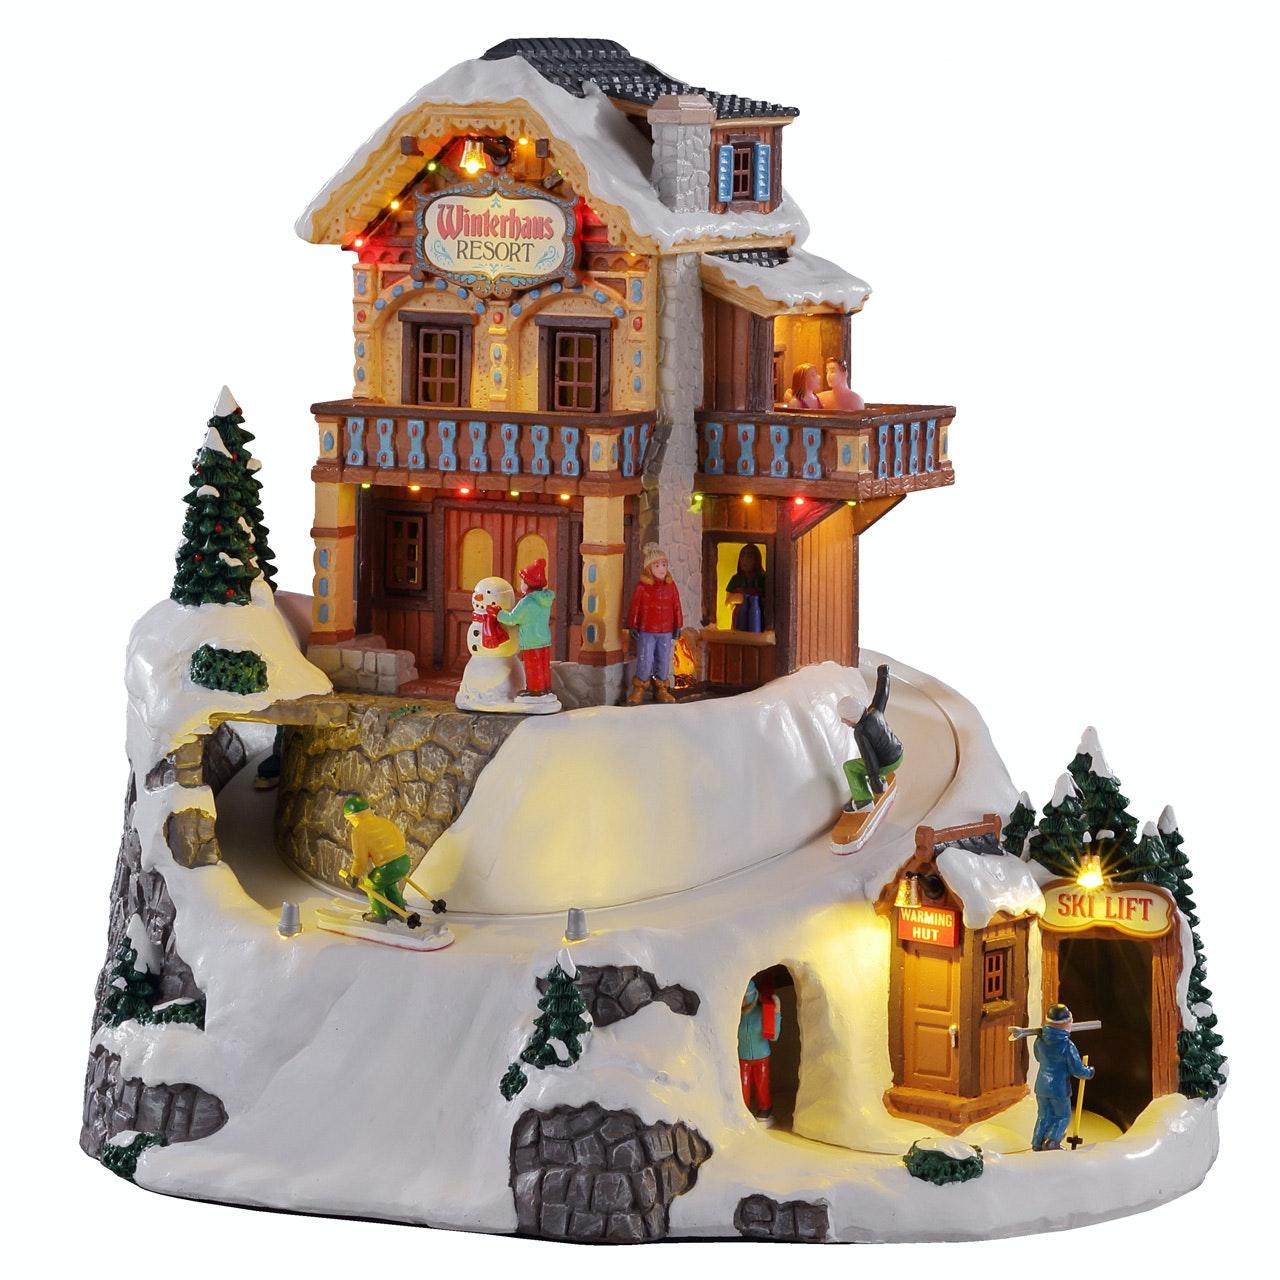 lemax_winterhaus_resort